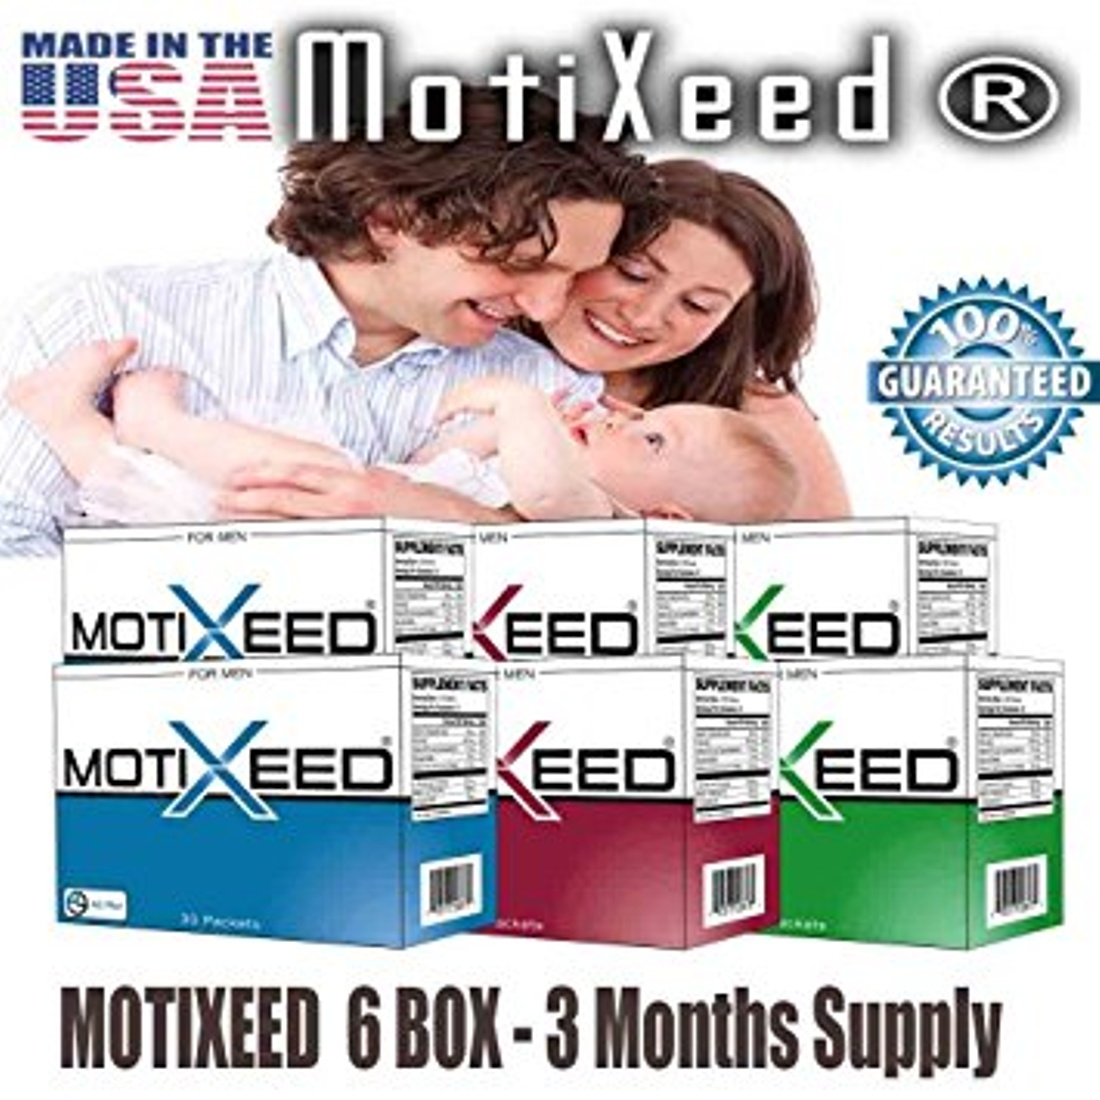 MOTIXEED® Men's Sperm Health Optimizer. Sperm Health vitamin - Male Fertility Booster.